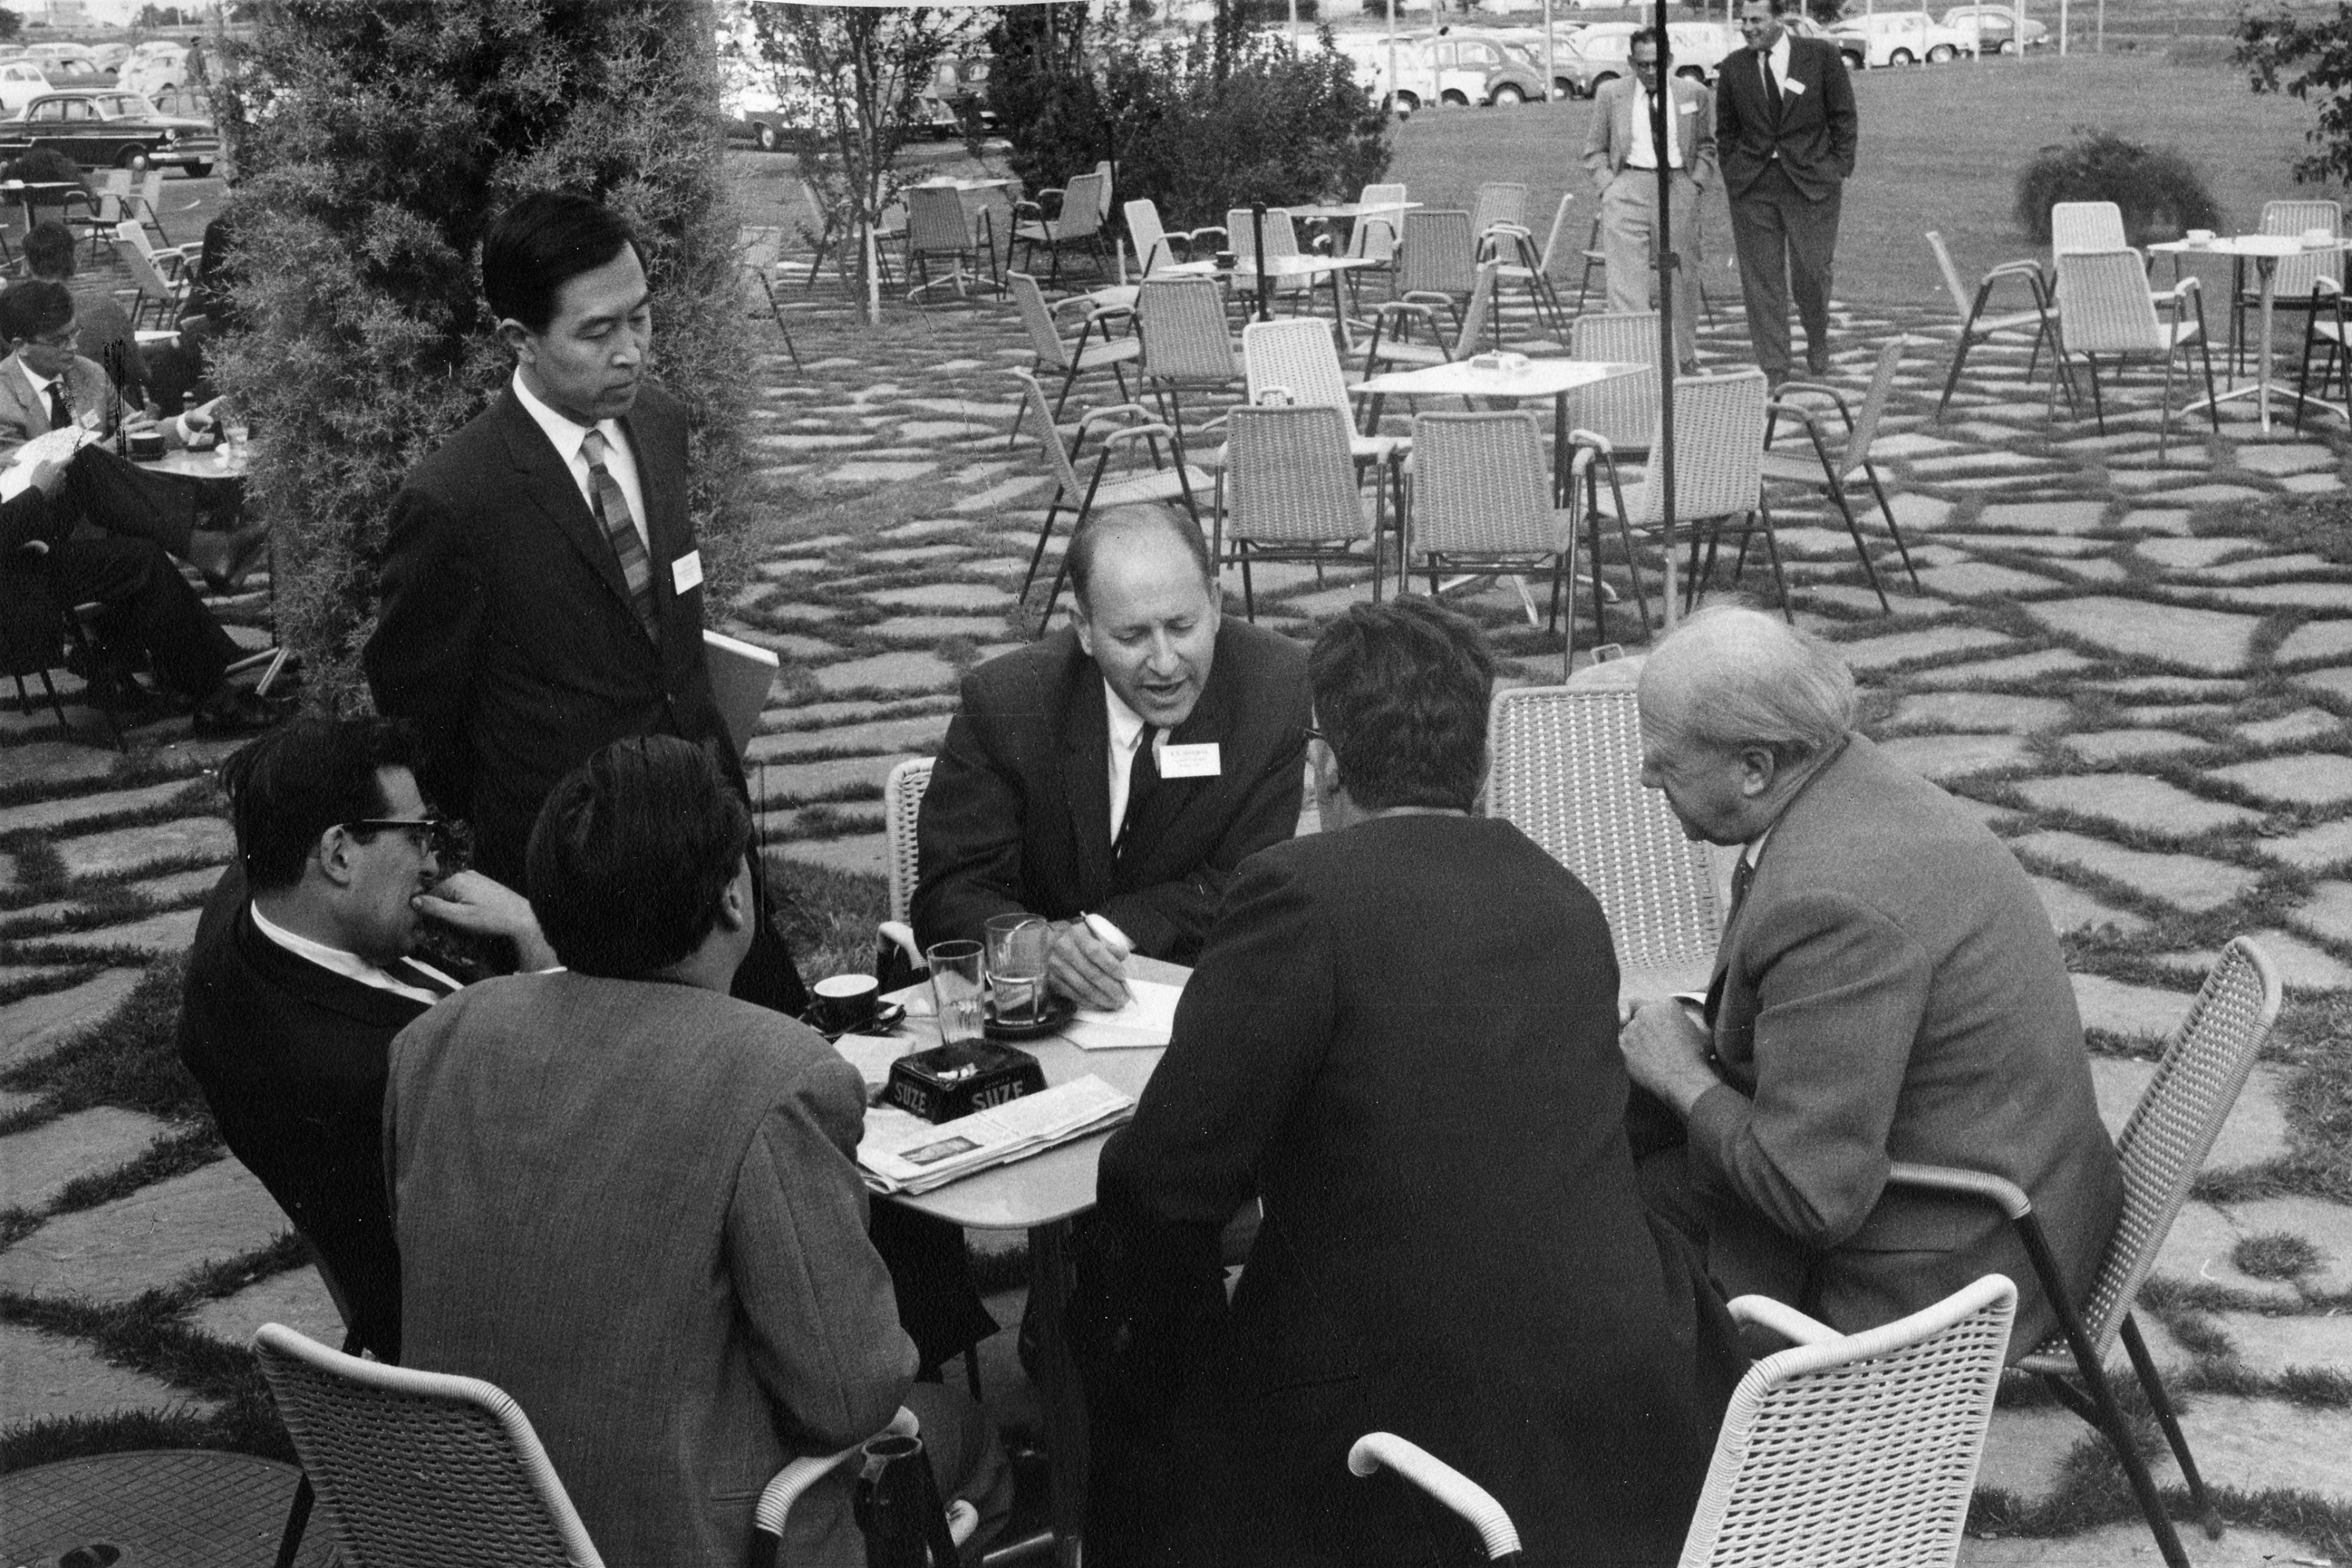 Candid group photo of Yoichiro Nambu, Julian Schwinger, Robert E. Marshak, Werner Heisenberg, and others